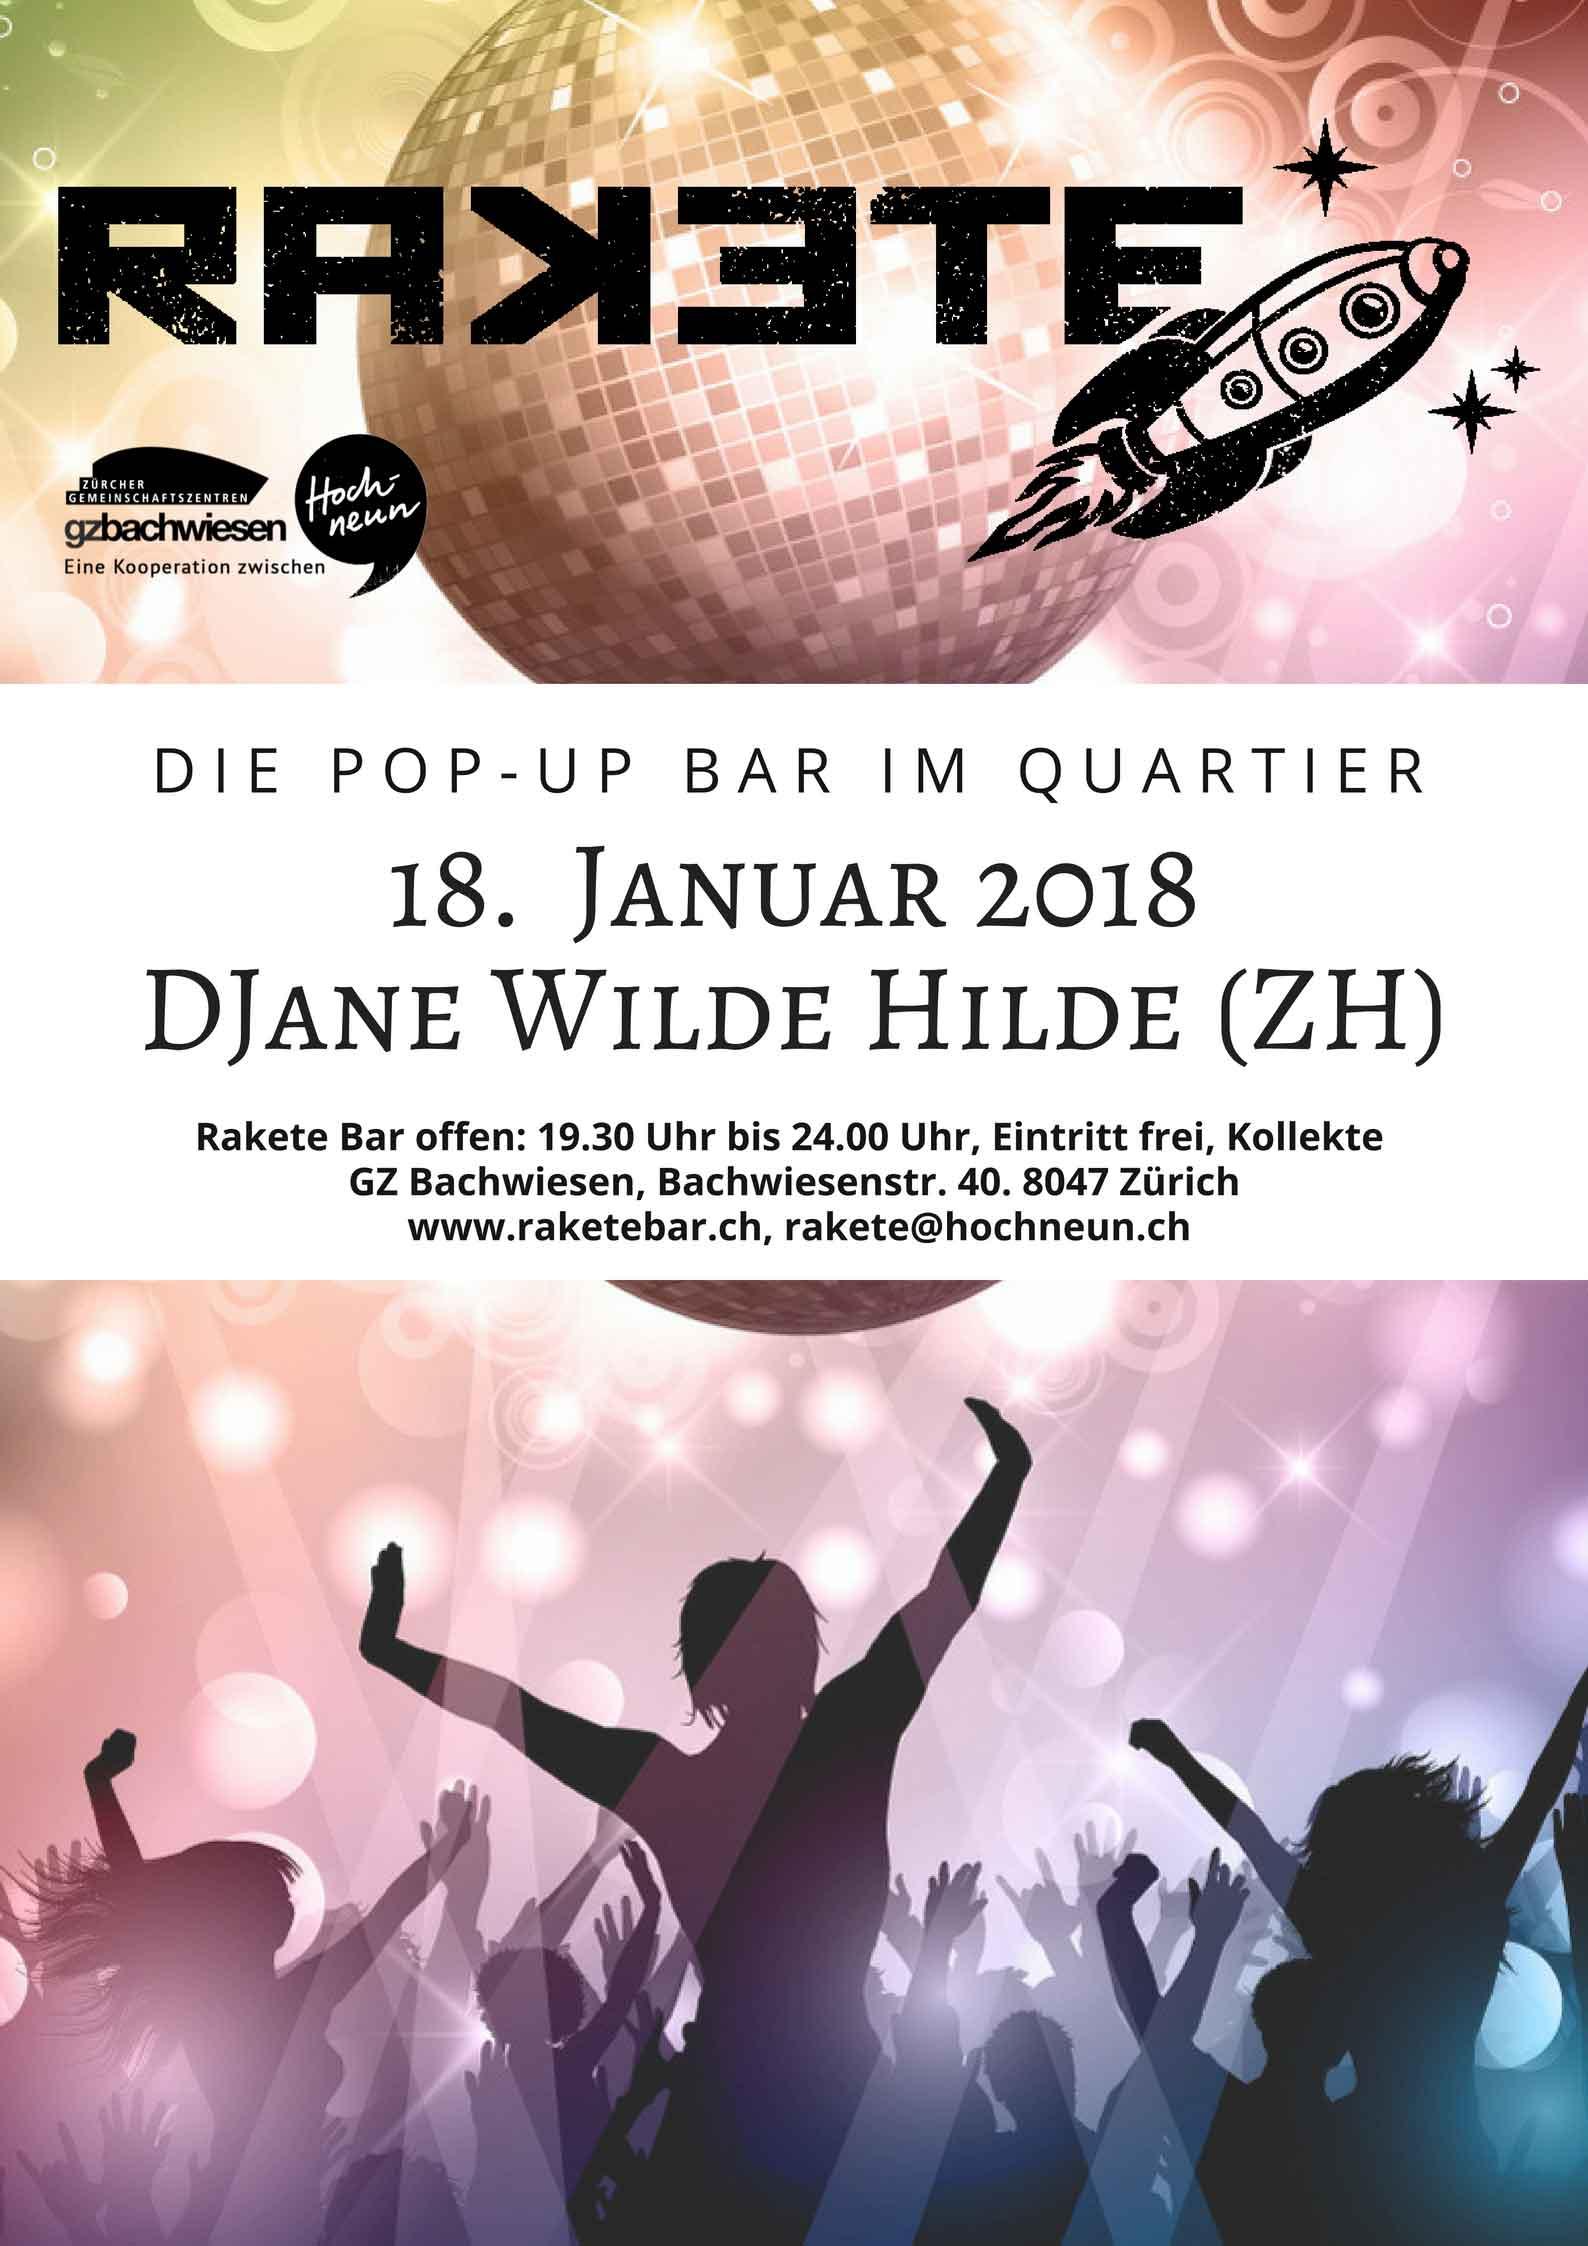 DJane Wilde Hilde (ZH)